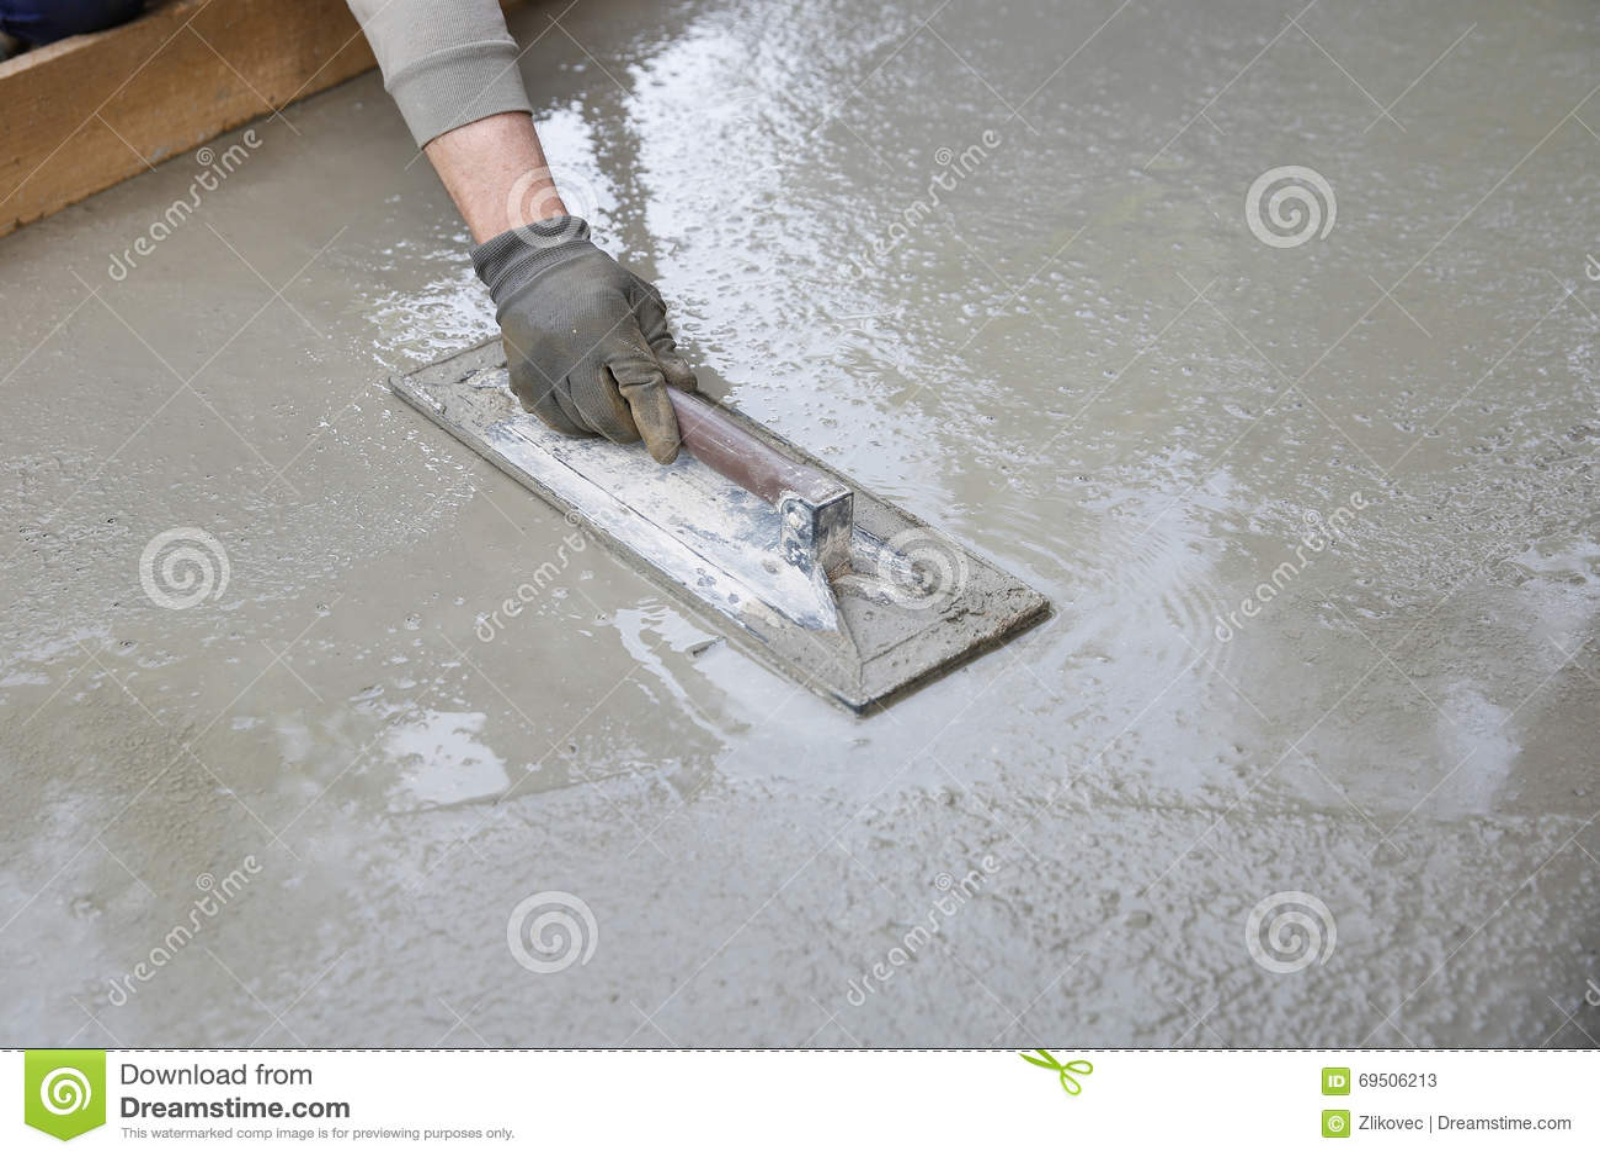 Mason leveling and screeding concrete floor base stock image image download comp solutioingenieria Choice Image